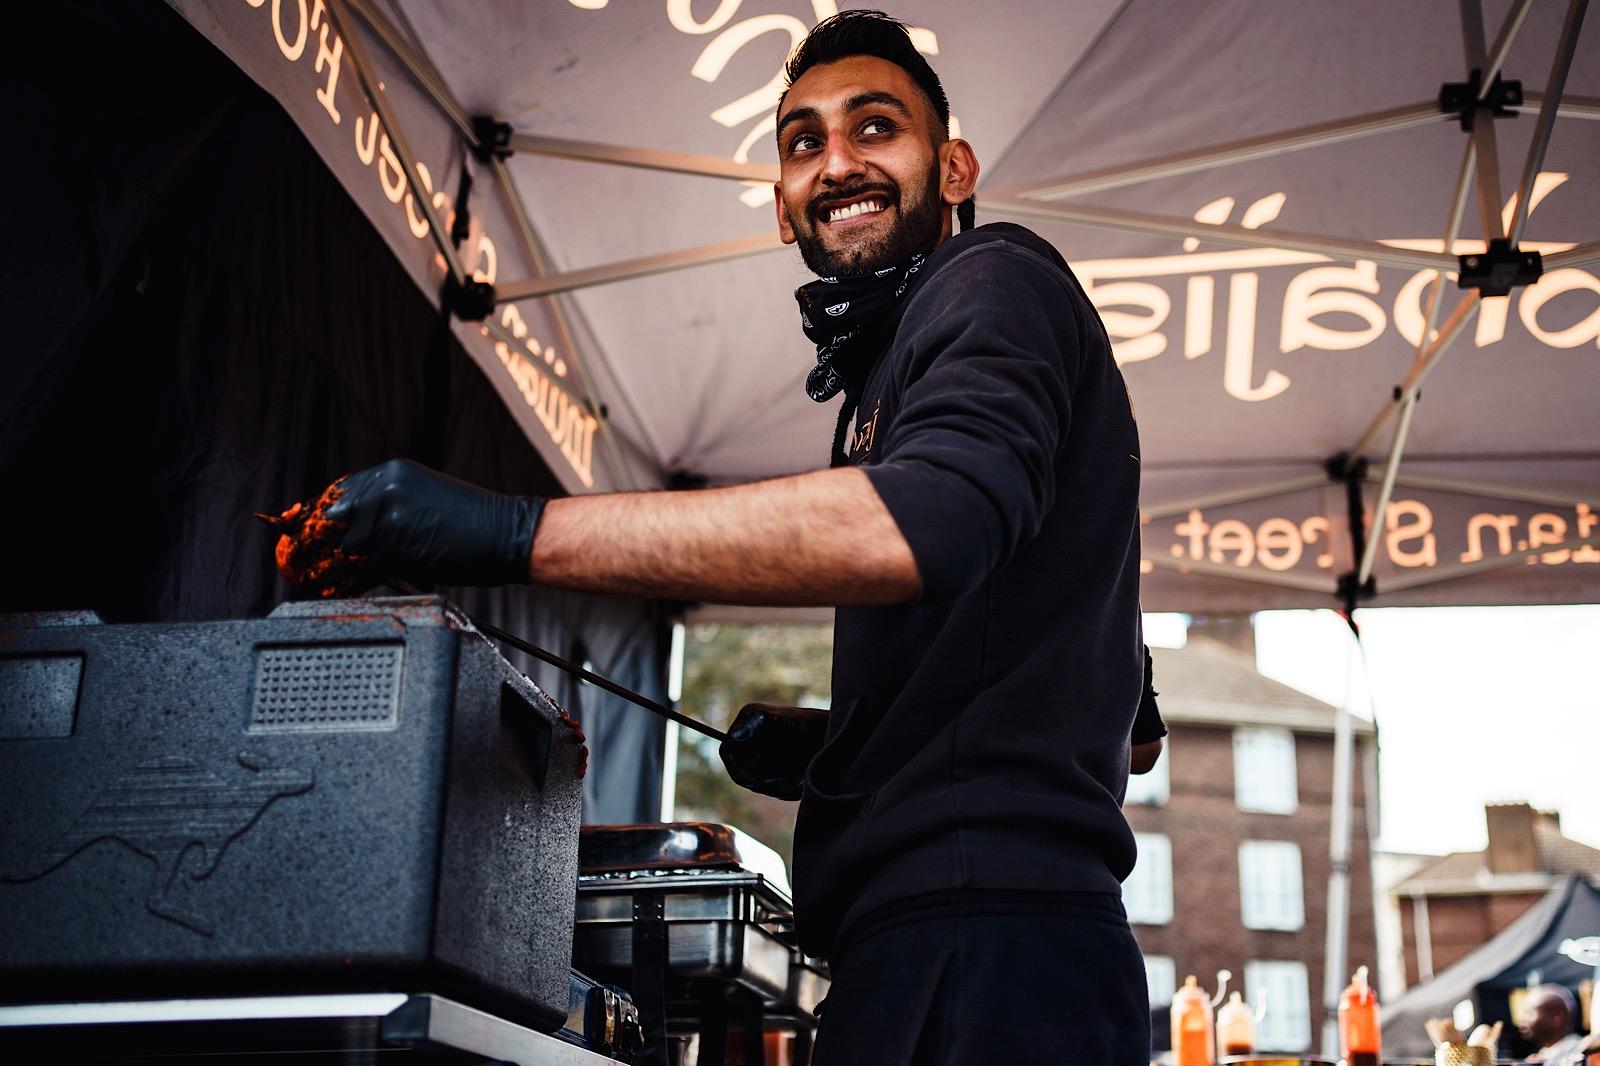 man preparing food outside grinning